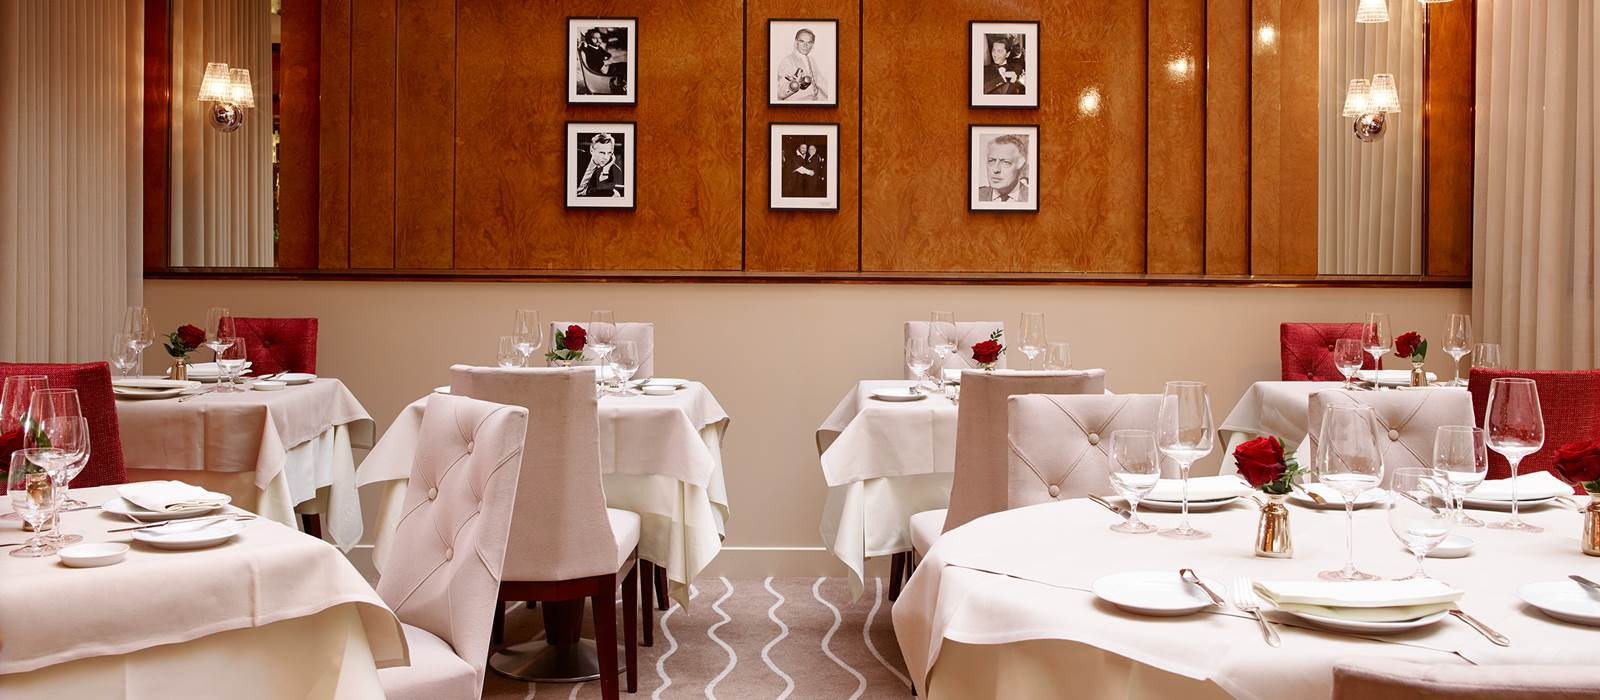 Penati al Baretto Restaurant and Bar | Hotel de Vigny Paris